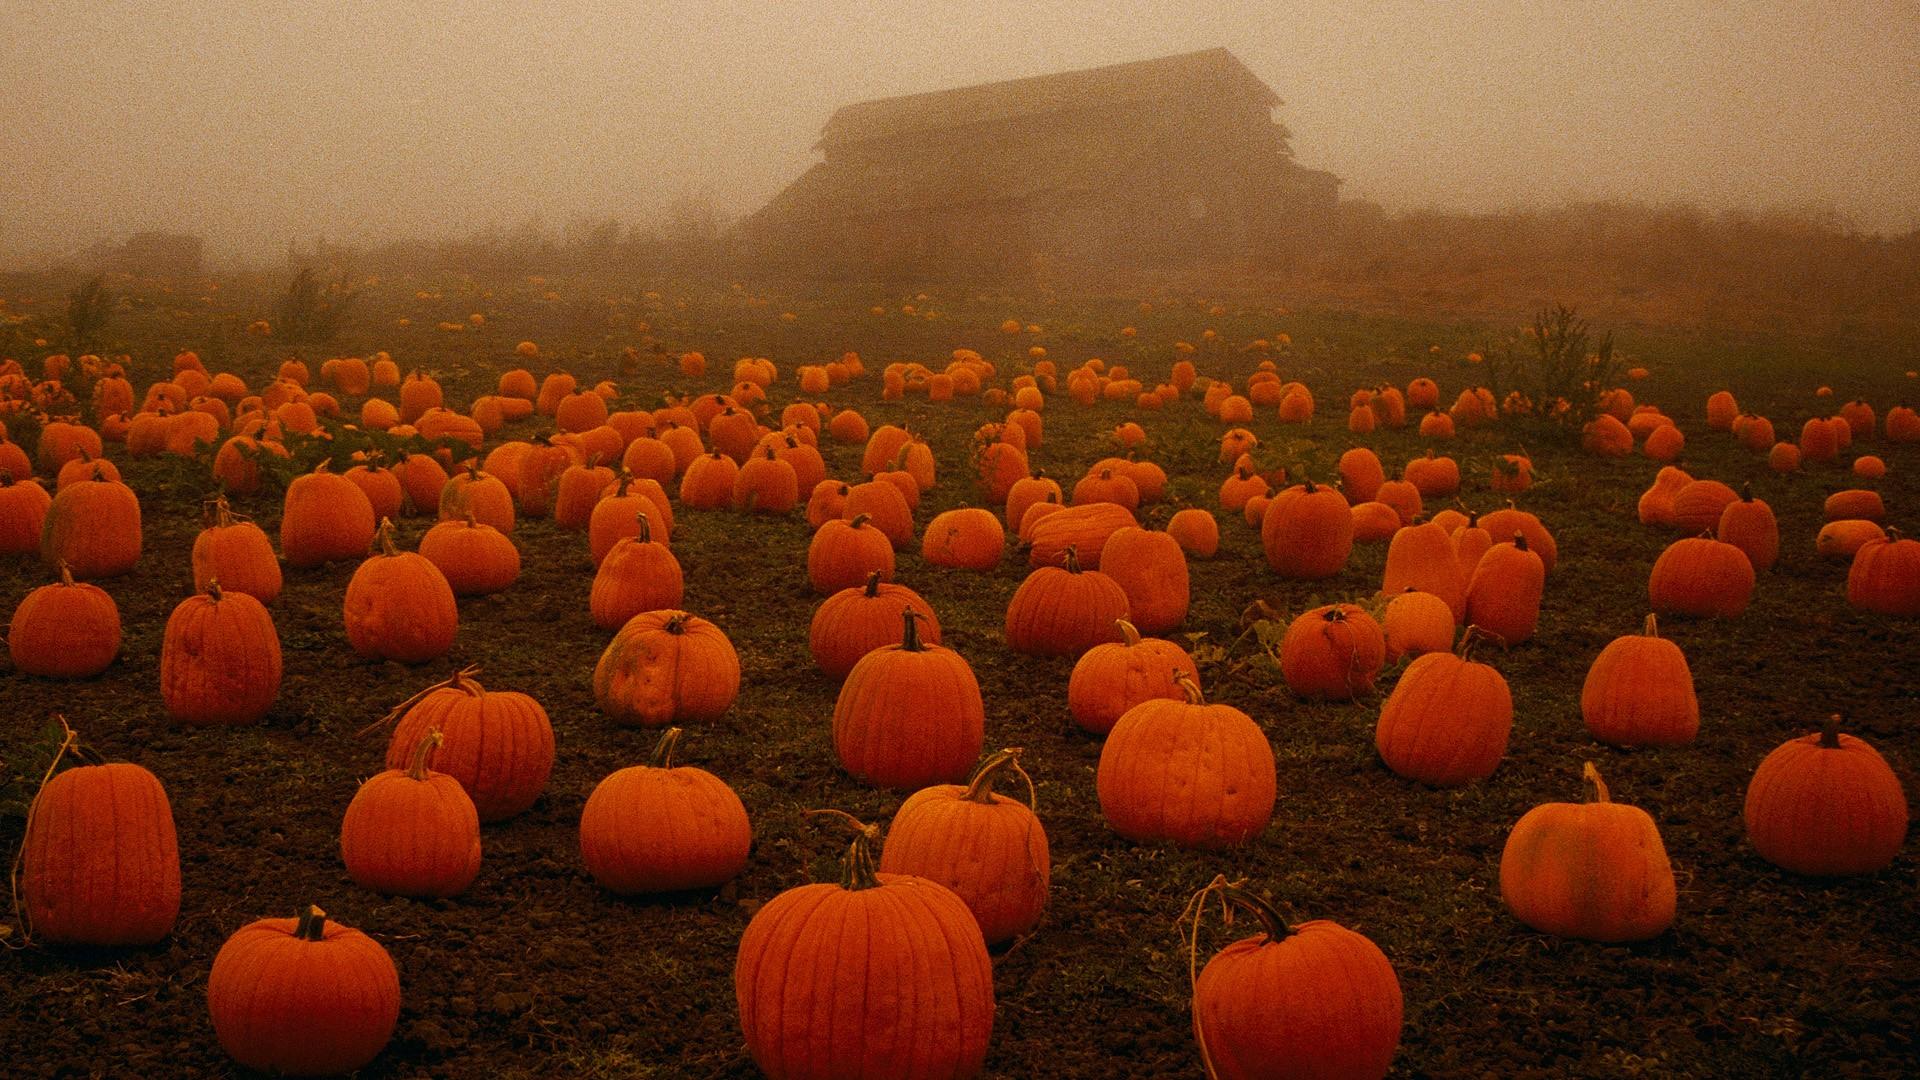 Wallpaper Pumpkin Field Fall Plants Spooky 1920x1080 Phlex0 1666529 Hd Wallpapers Wallhere